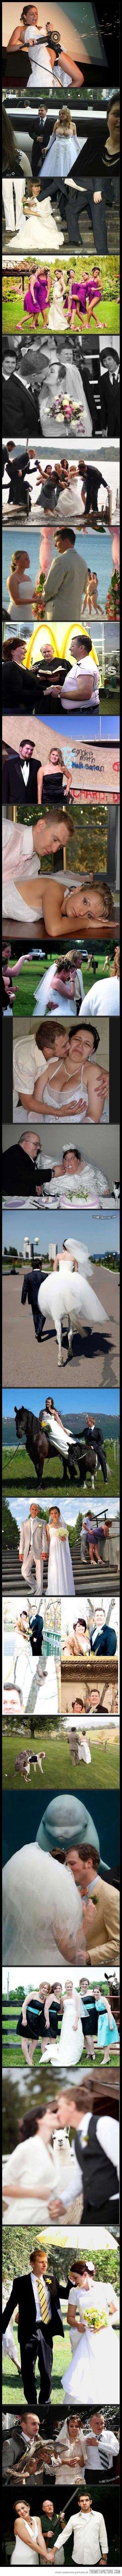 Funny Crazy Wedding Photos